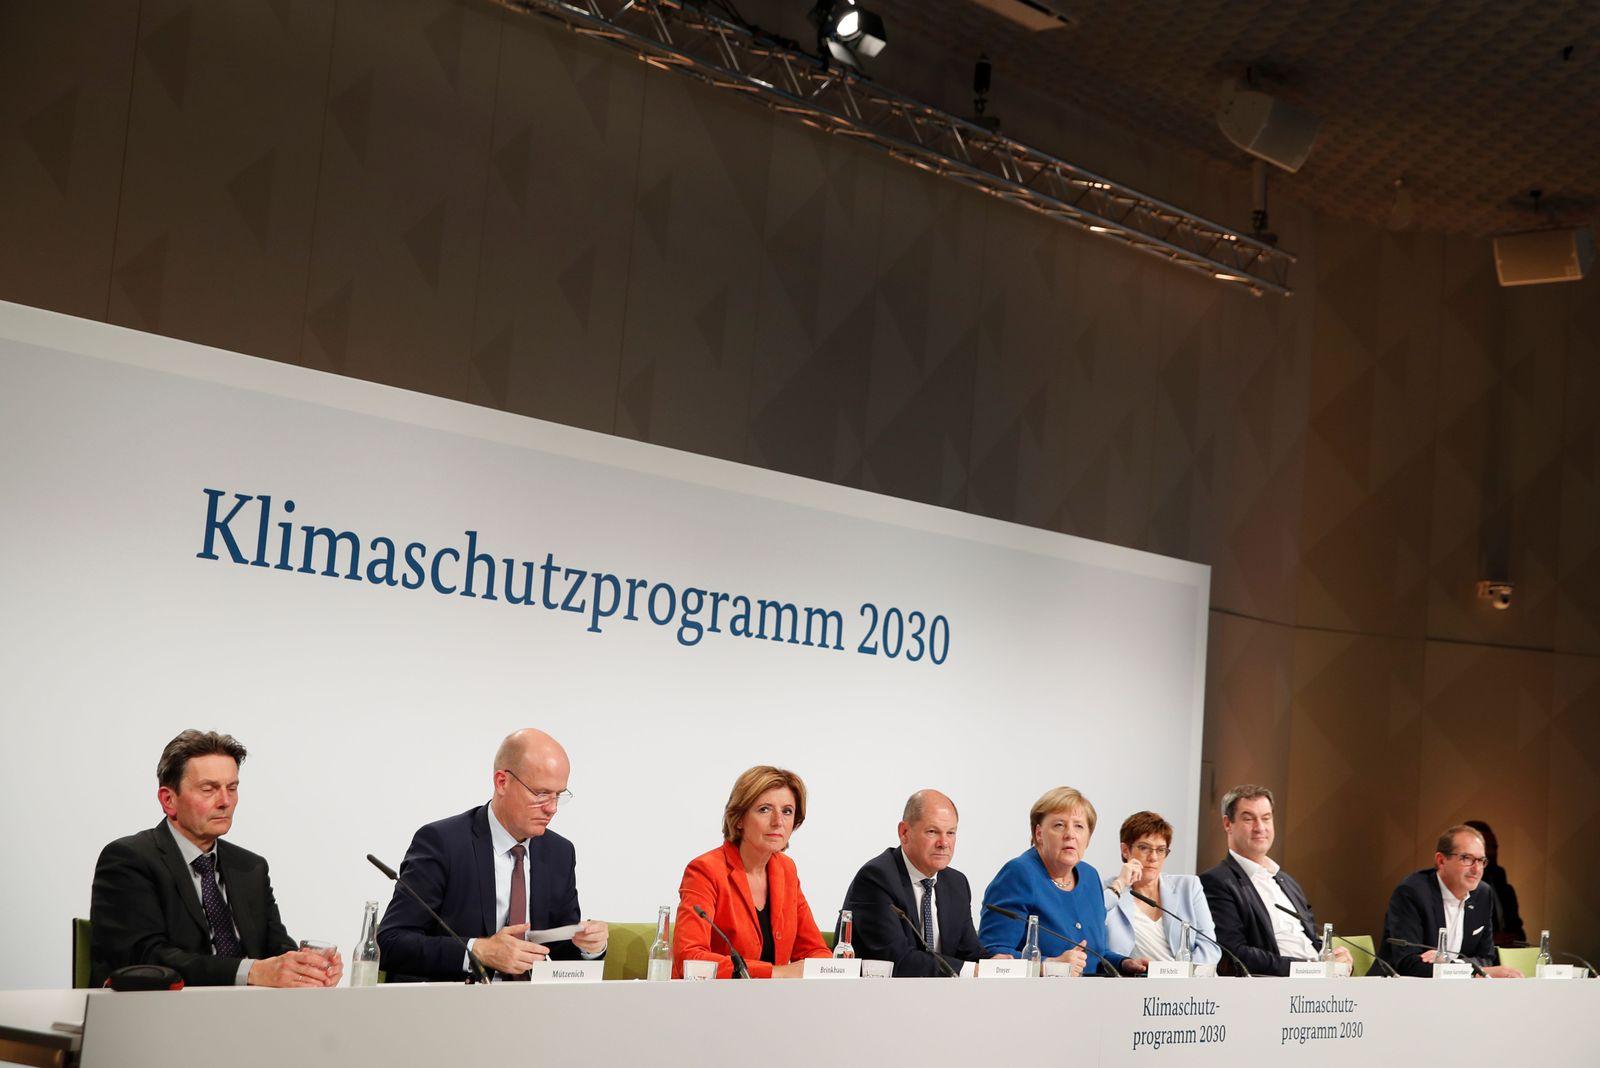 Klimaschutzprogramm/ GroKo/ Klimapaket/ 2019